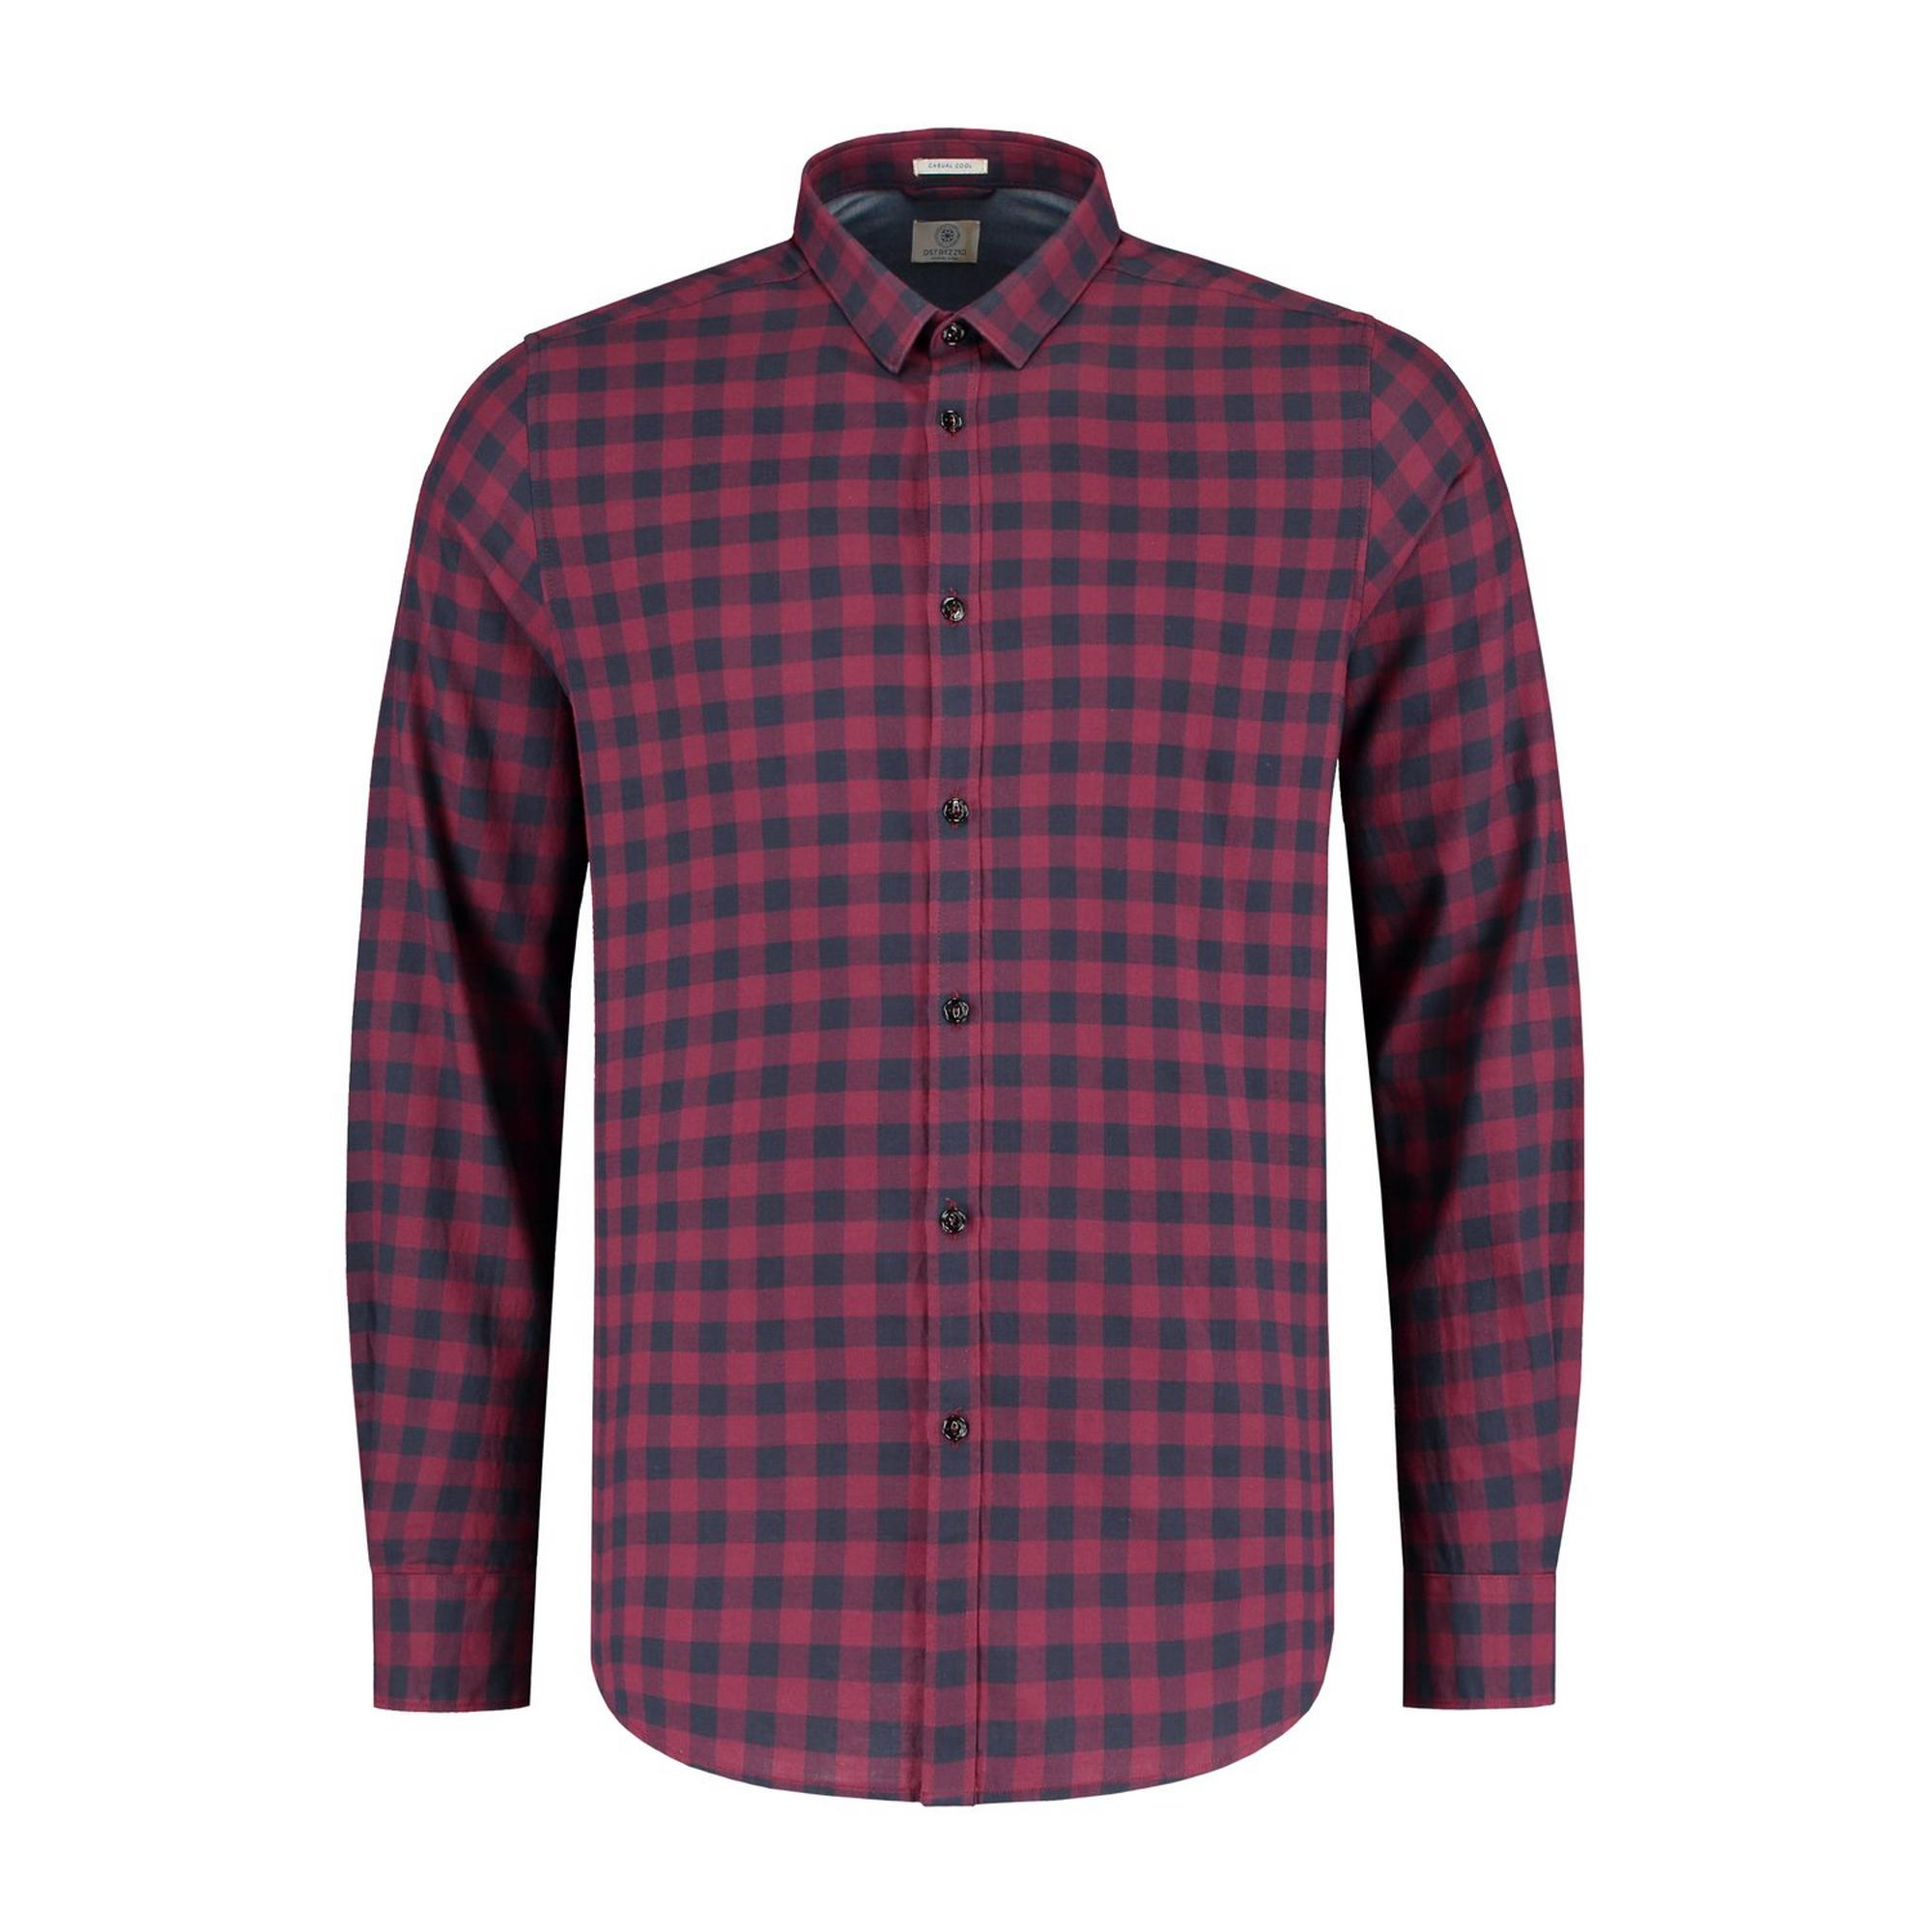 Men's Tonal Block Check Peach Twill Woven Long Sleeve Shirt